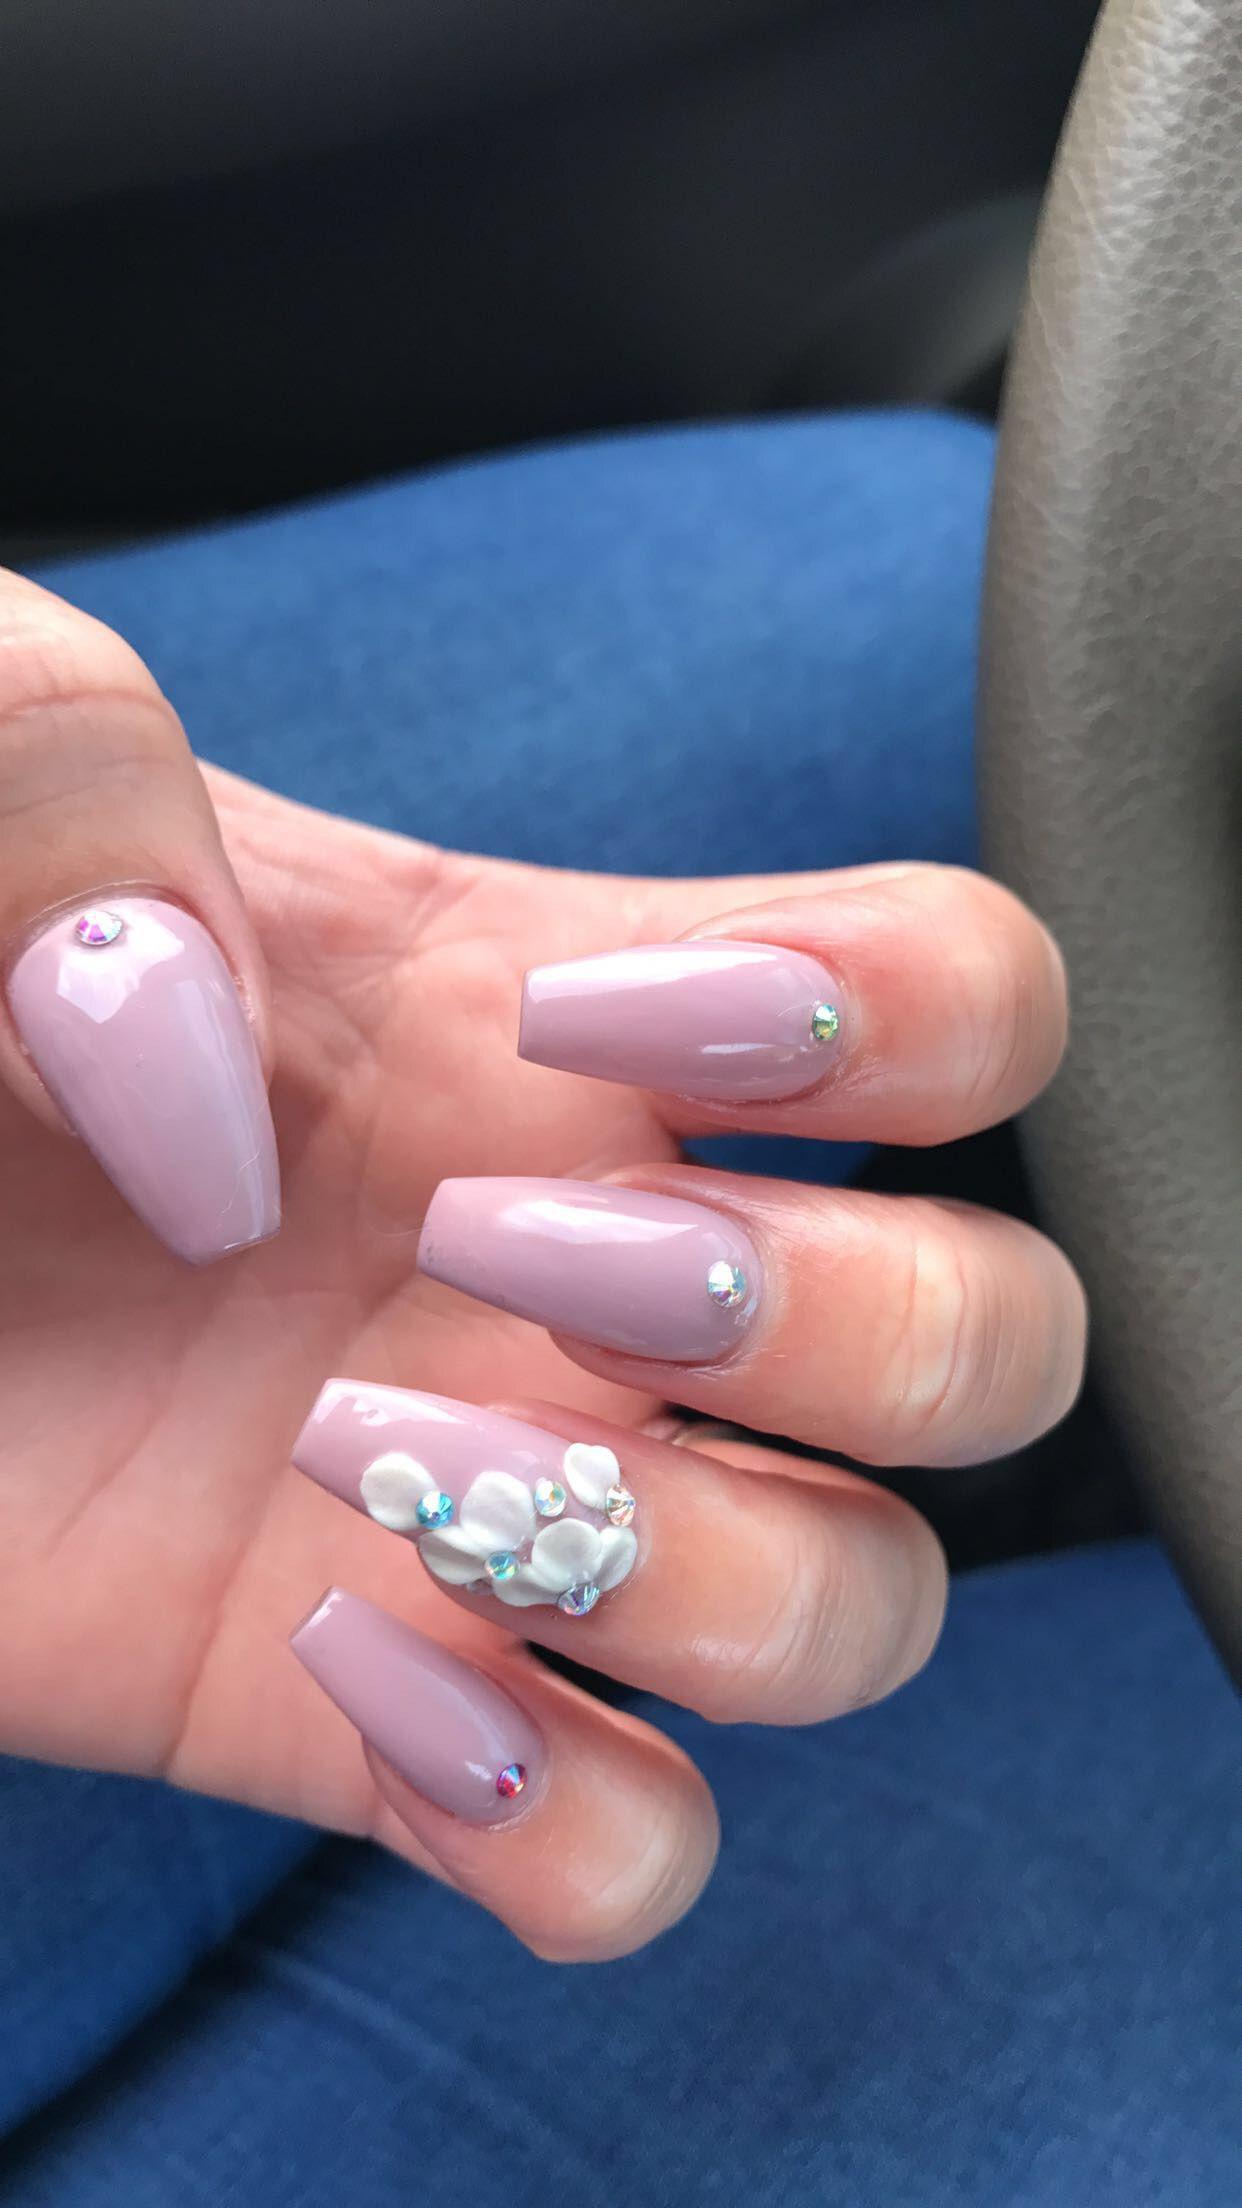 Cute Acrylic Nails With Rhinestones | www.pixshark.com ...